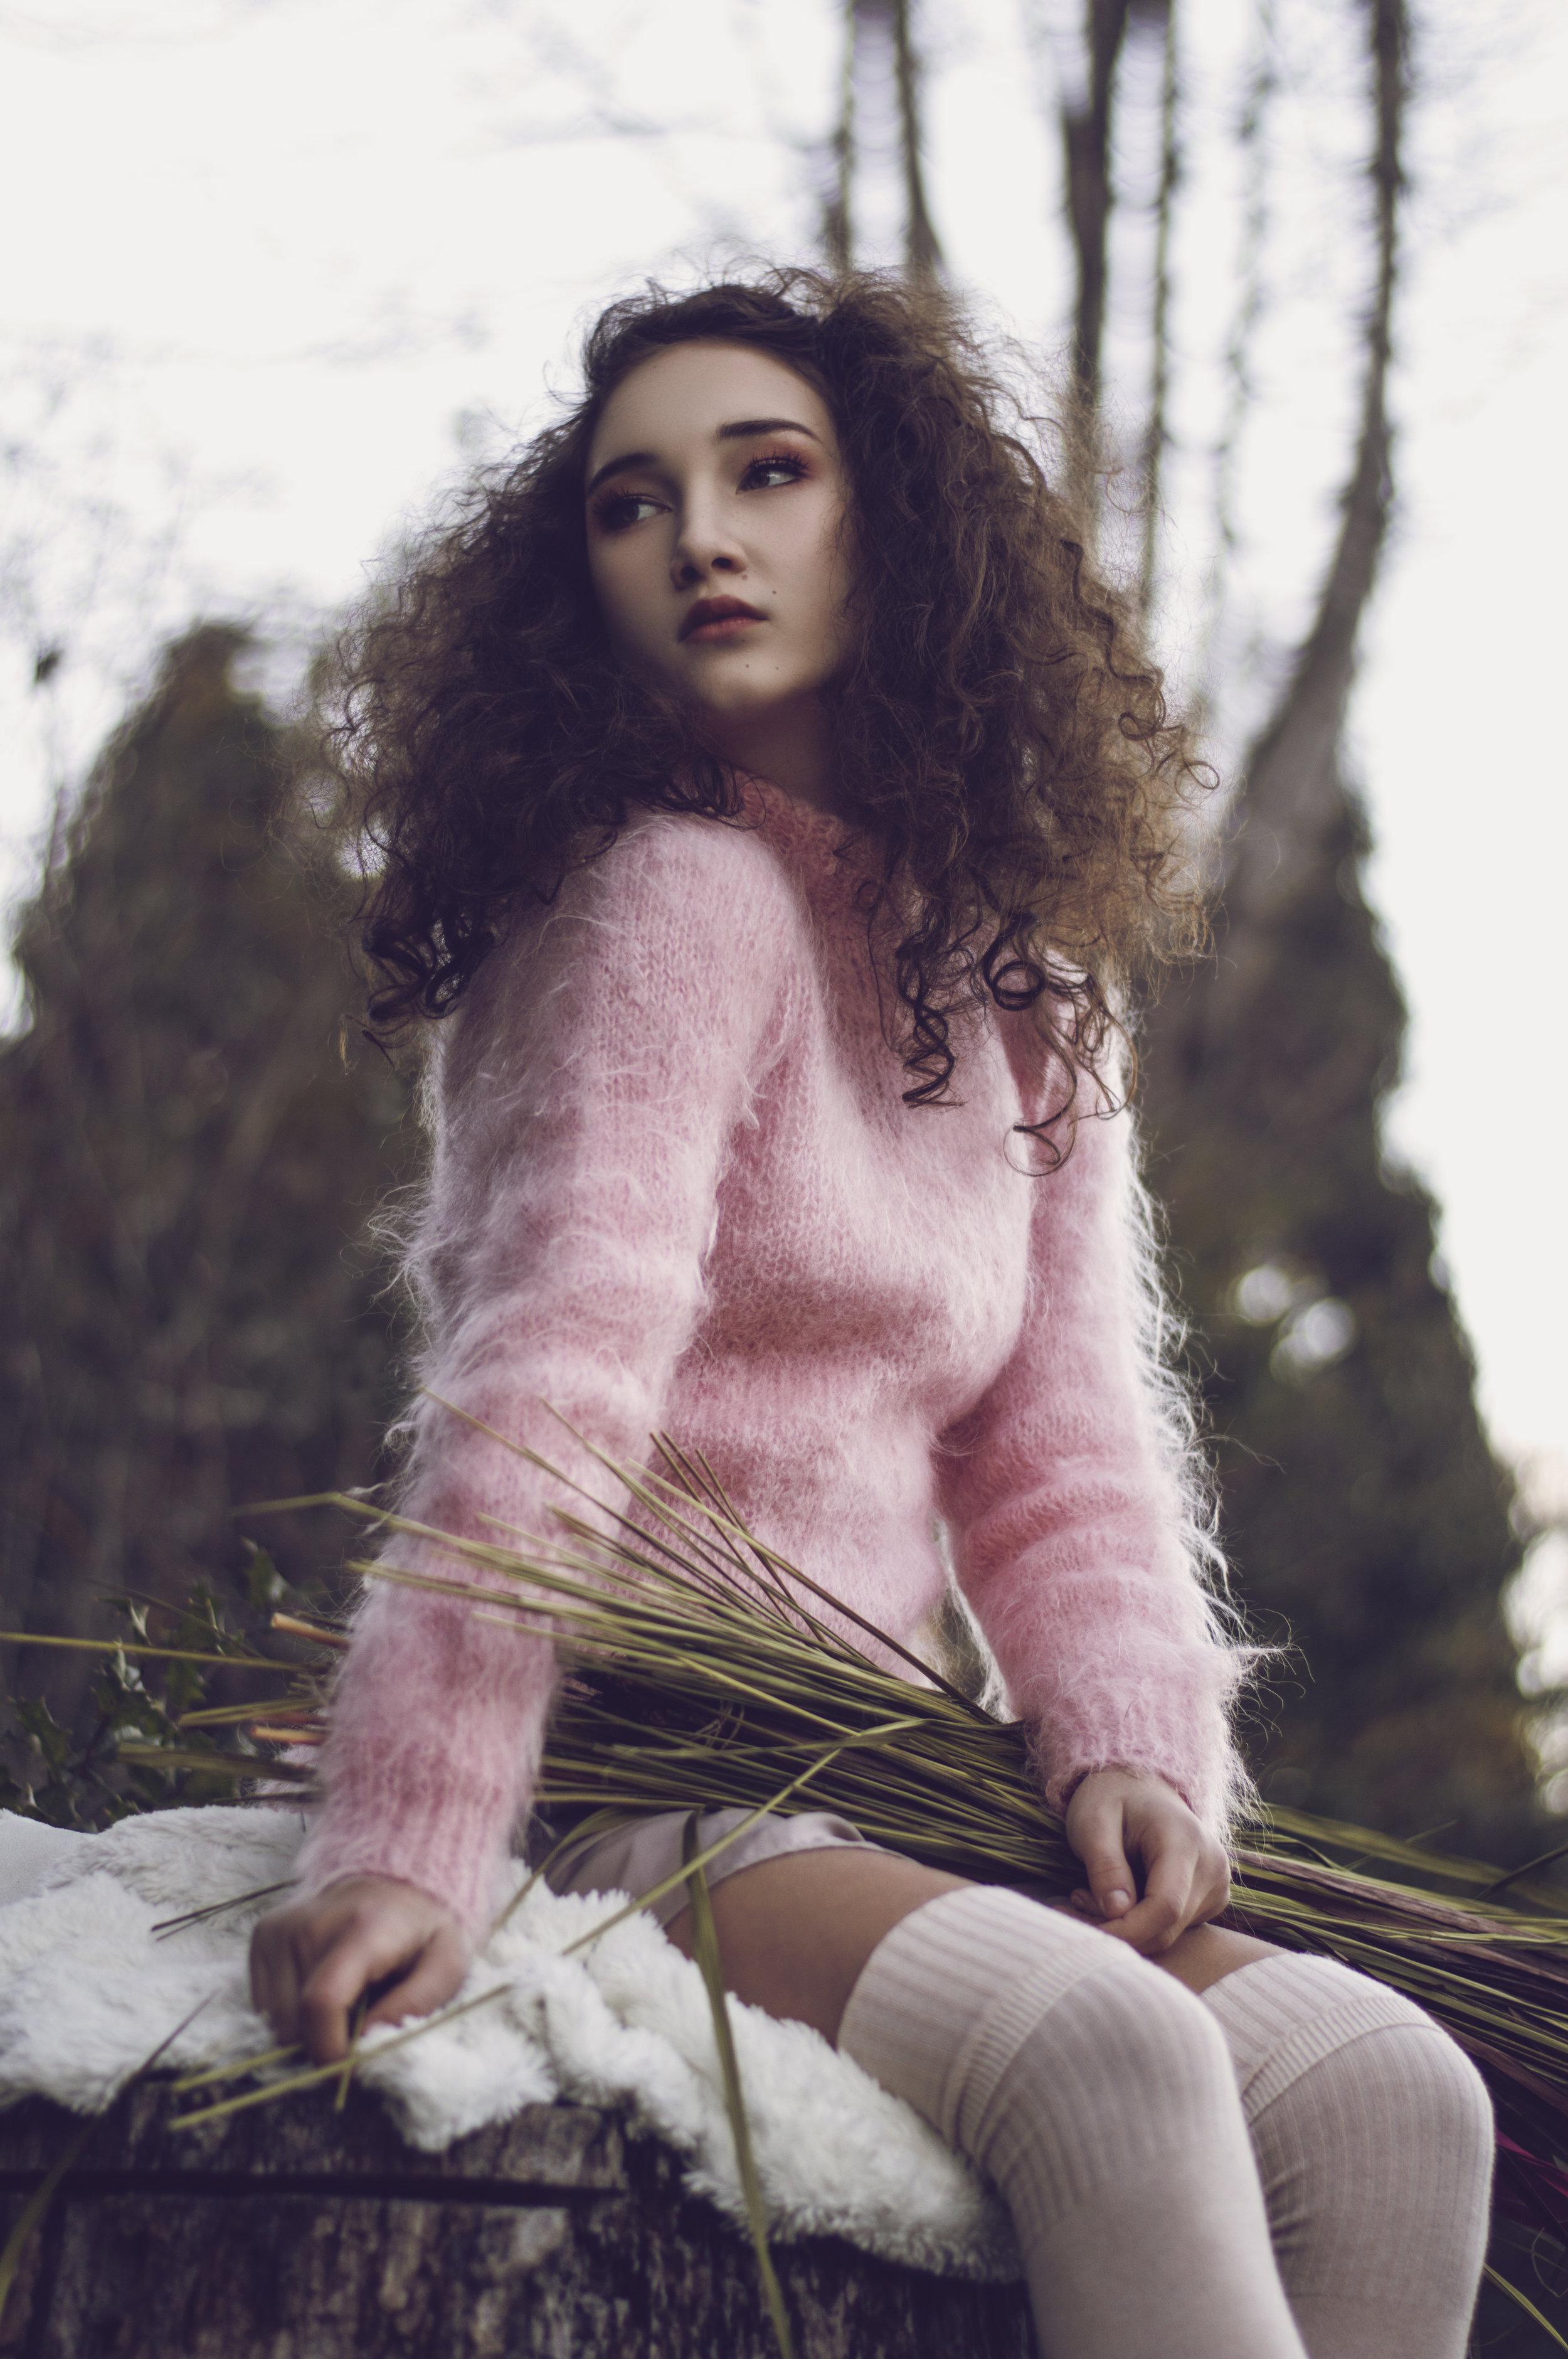 Dolldreams - Dreamingless Magazine Model Aislin Freya Pax